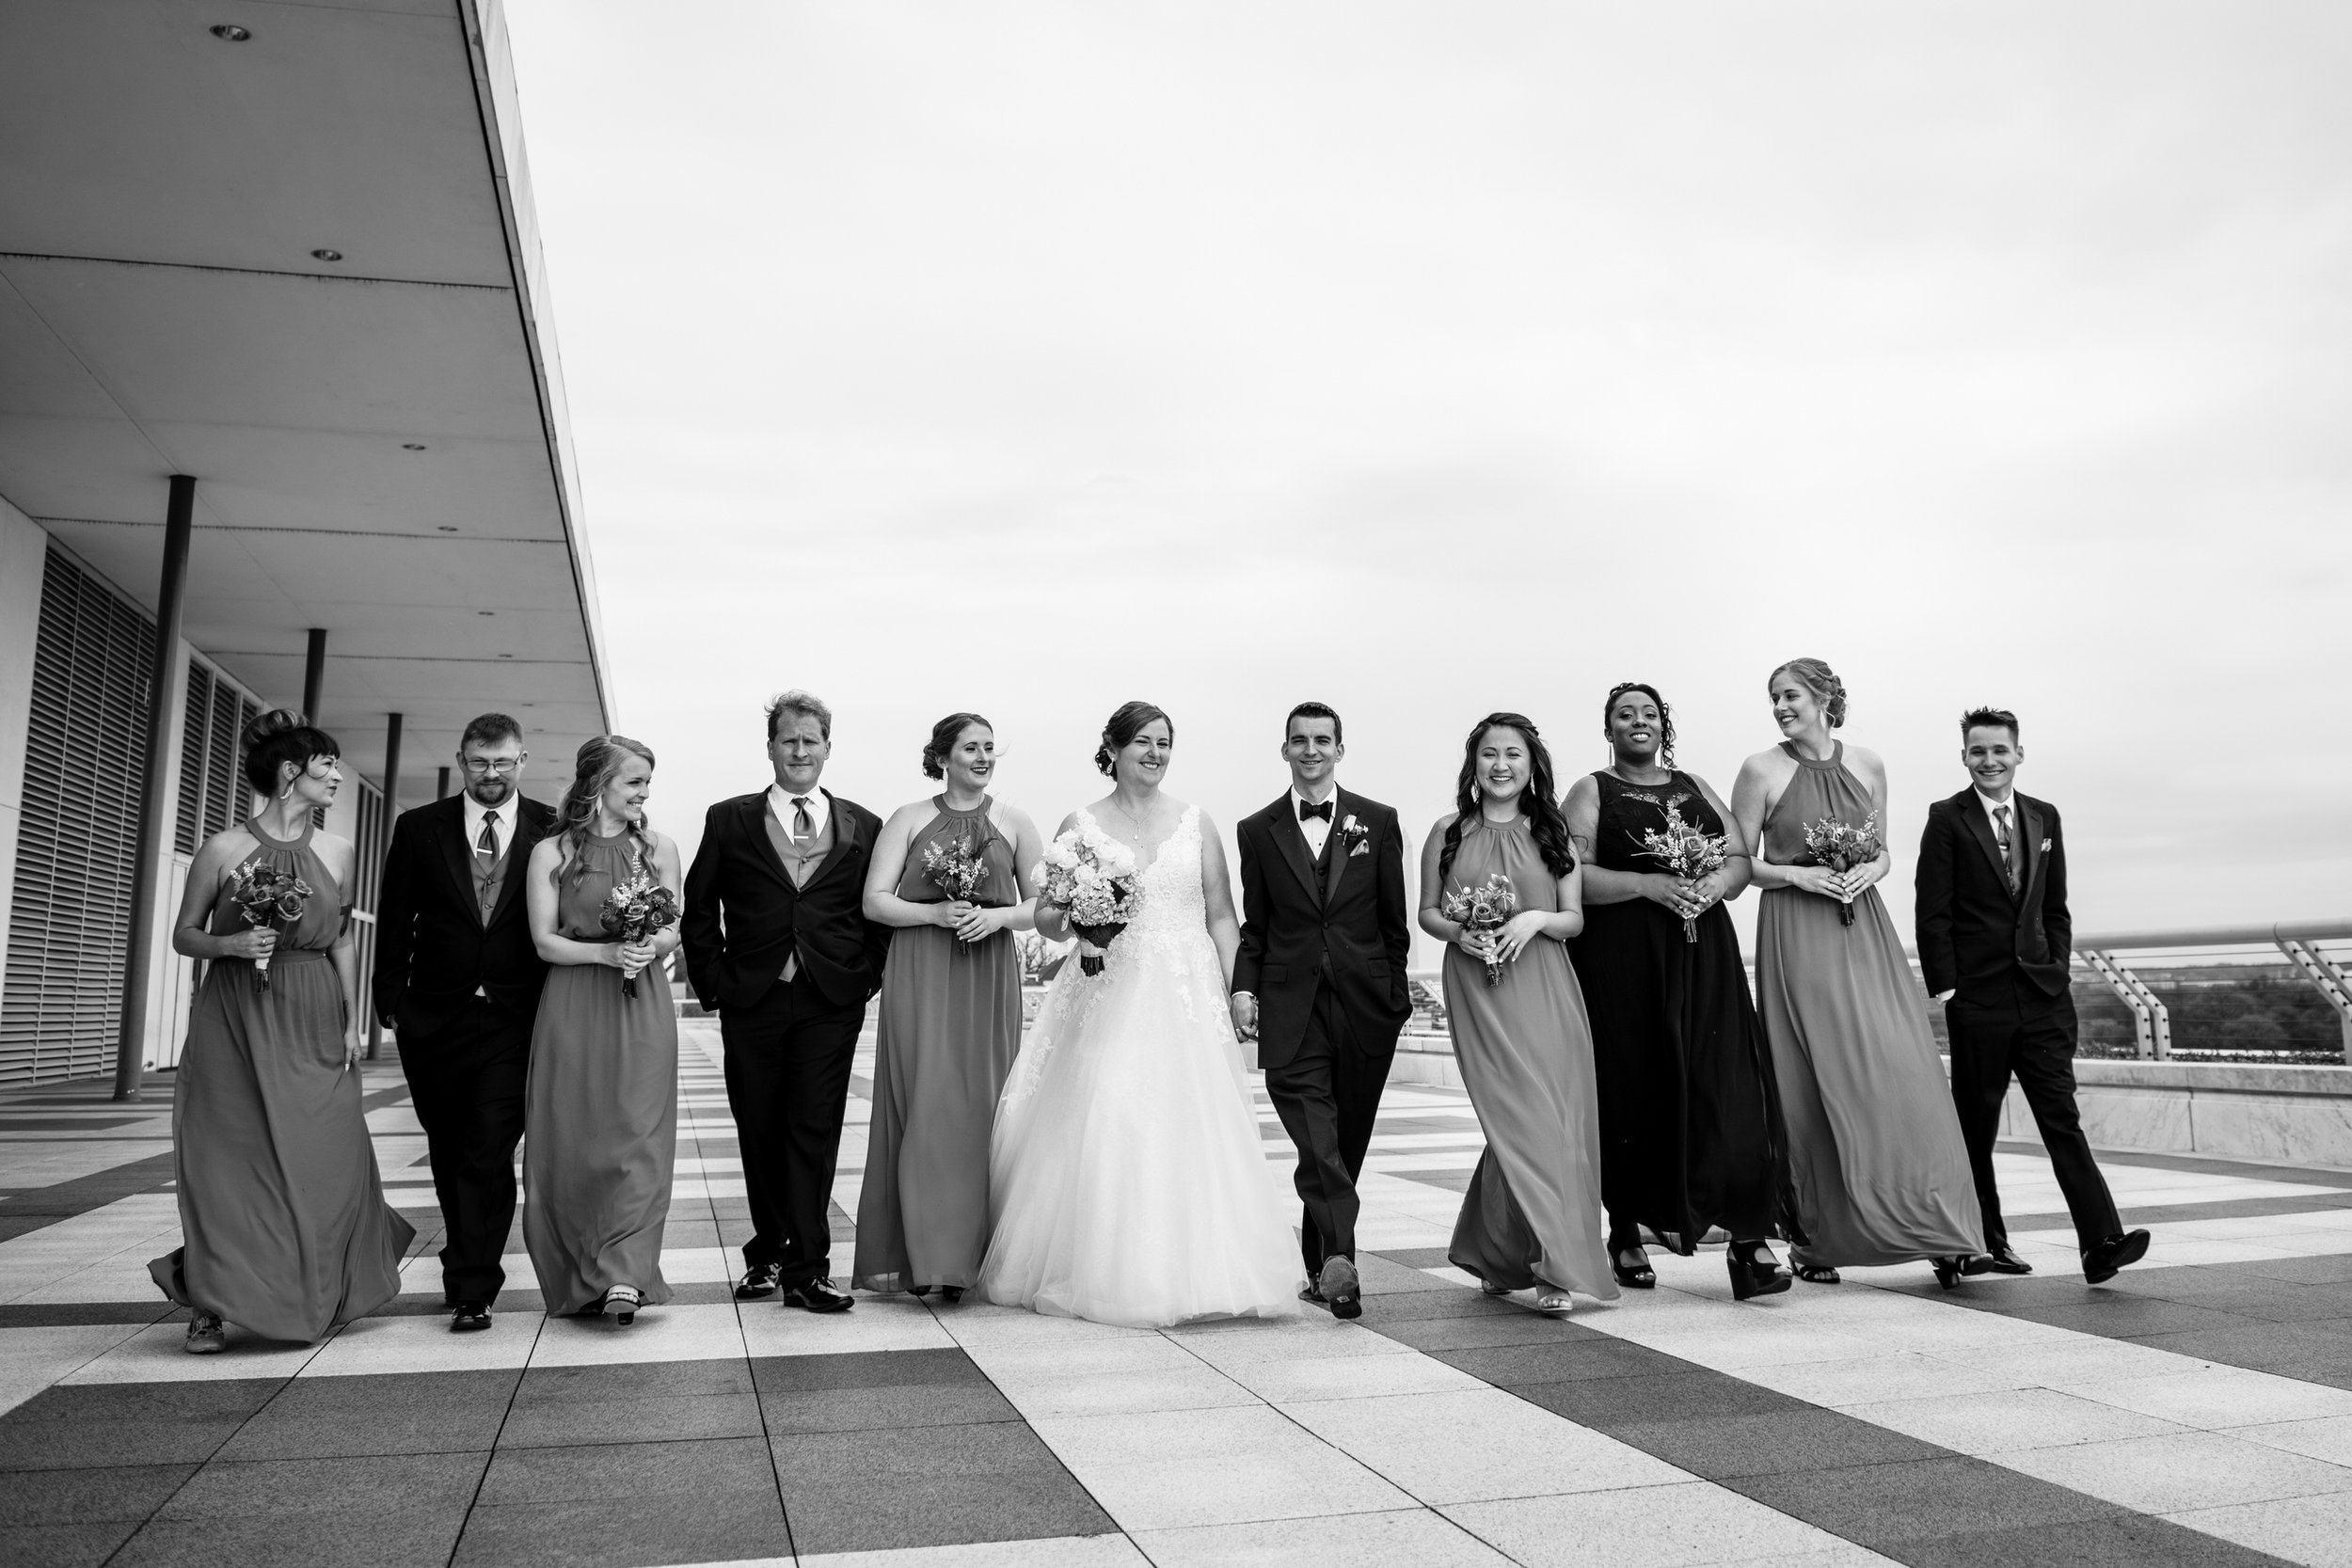 MarriottDC-Sarah&Sasha-WeddingParty-9920.jpg